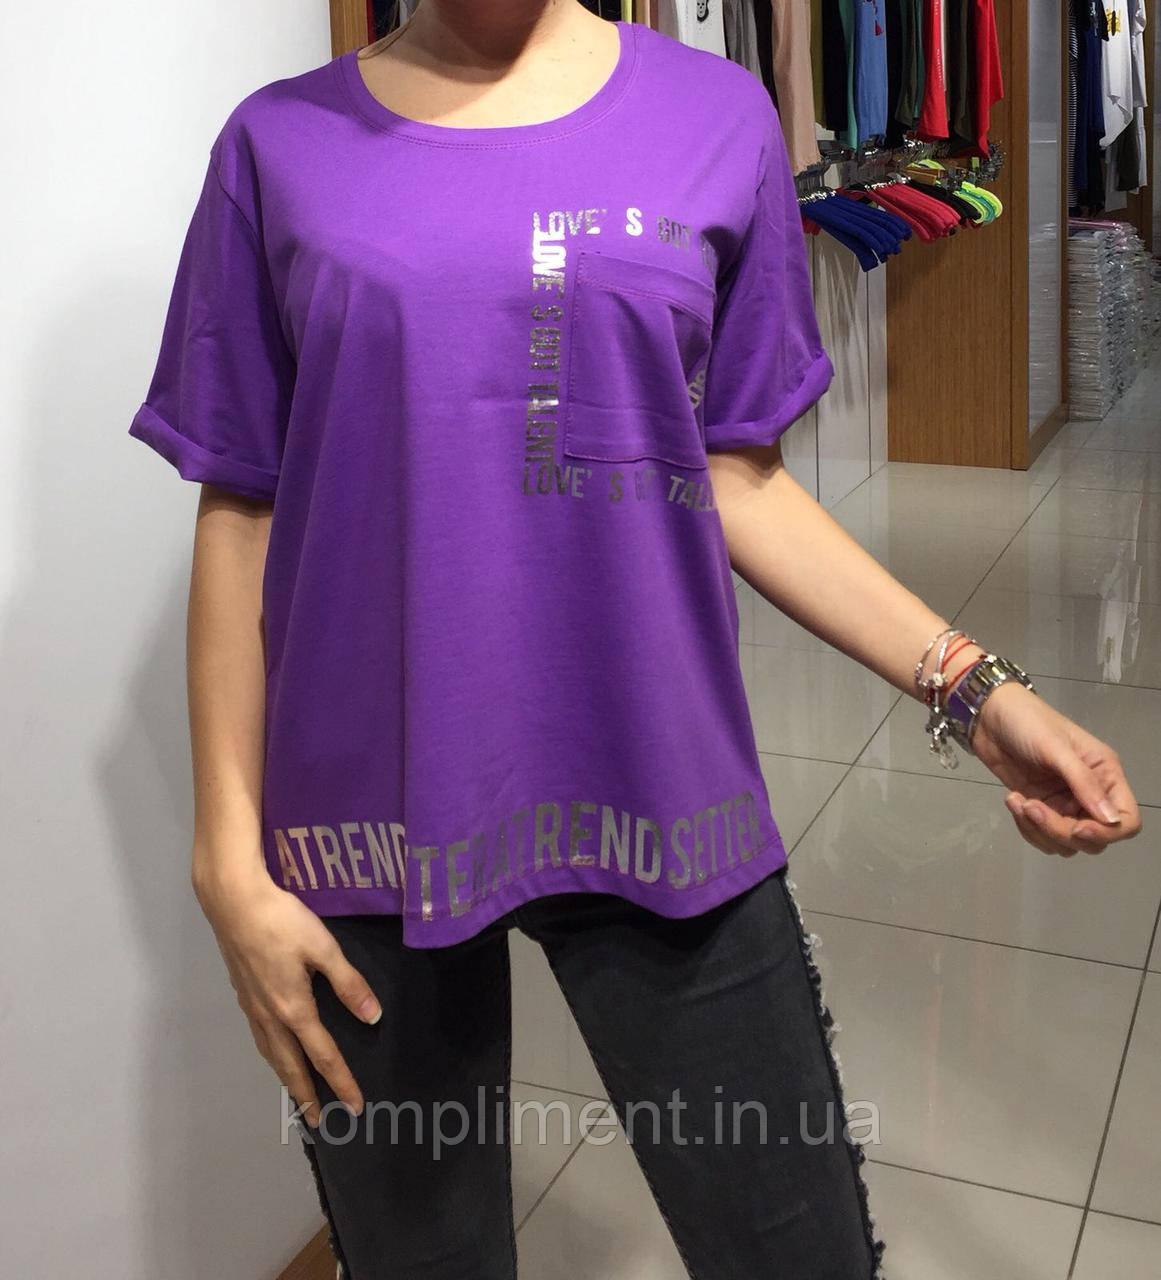 Летняя женская турецкая футболка полубатал